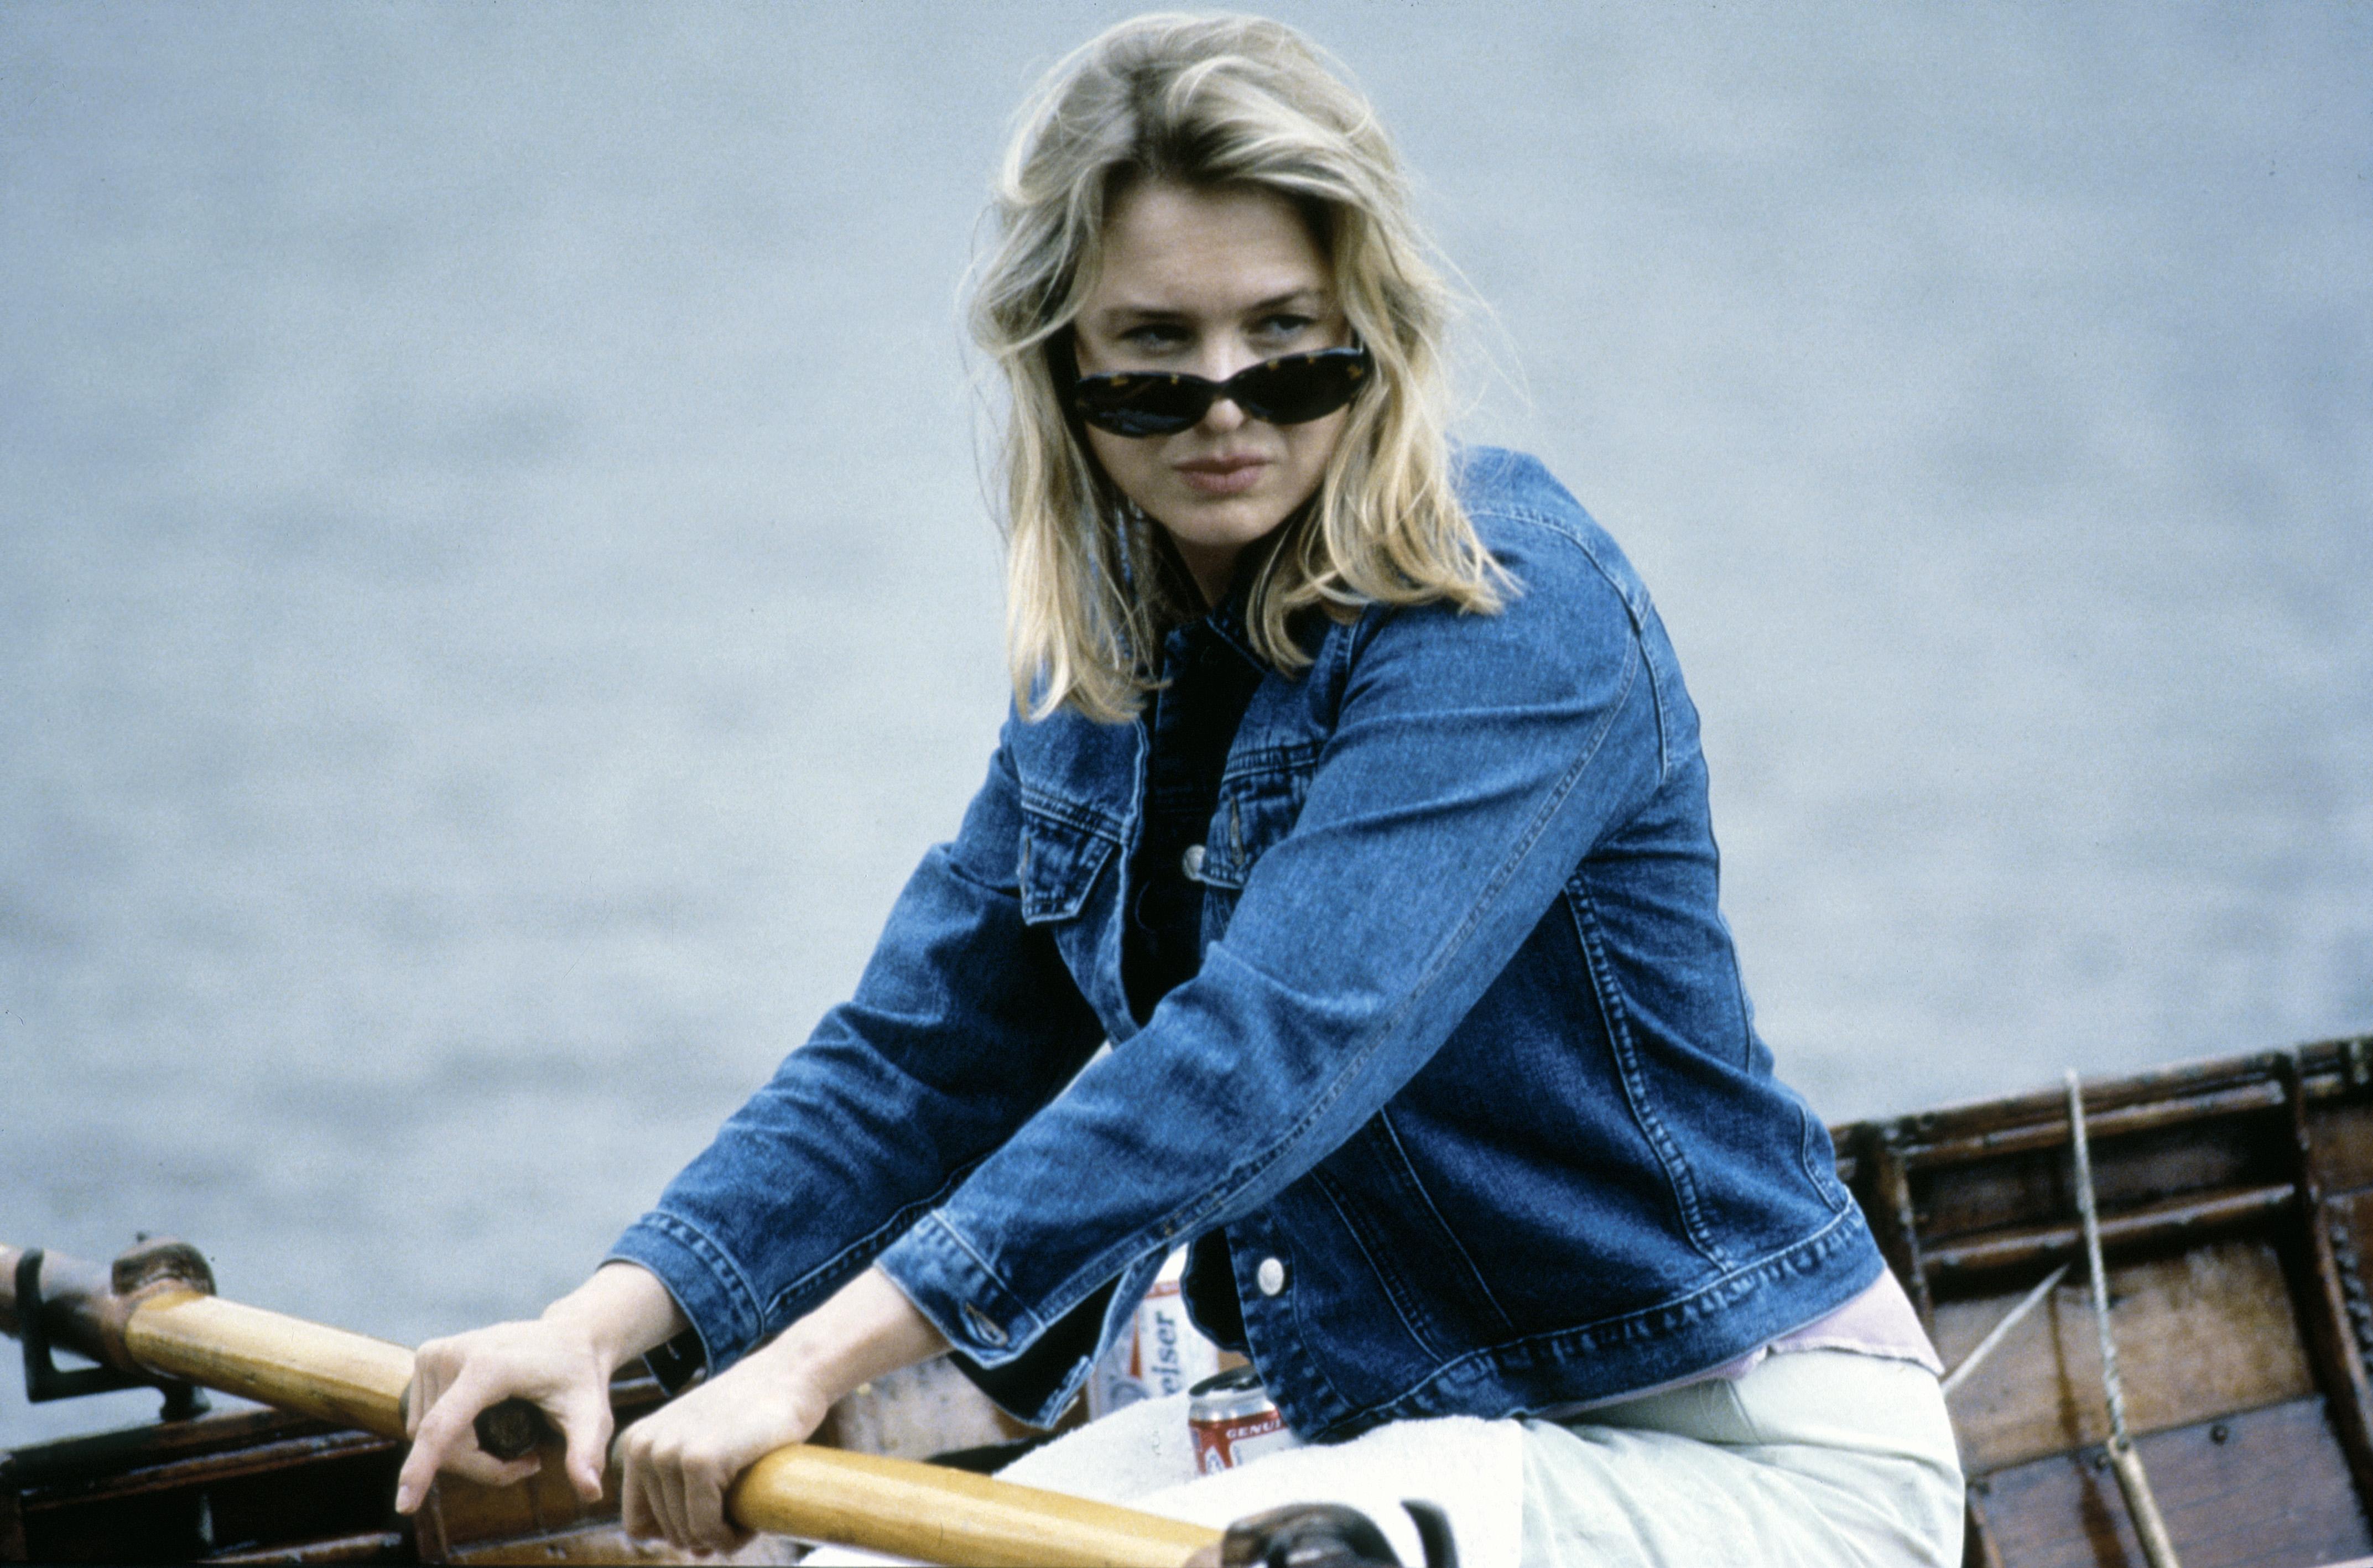 The Boat (The Bridget Jone's Diary)